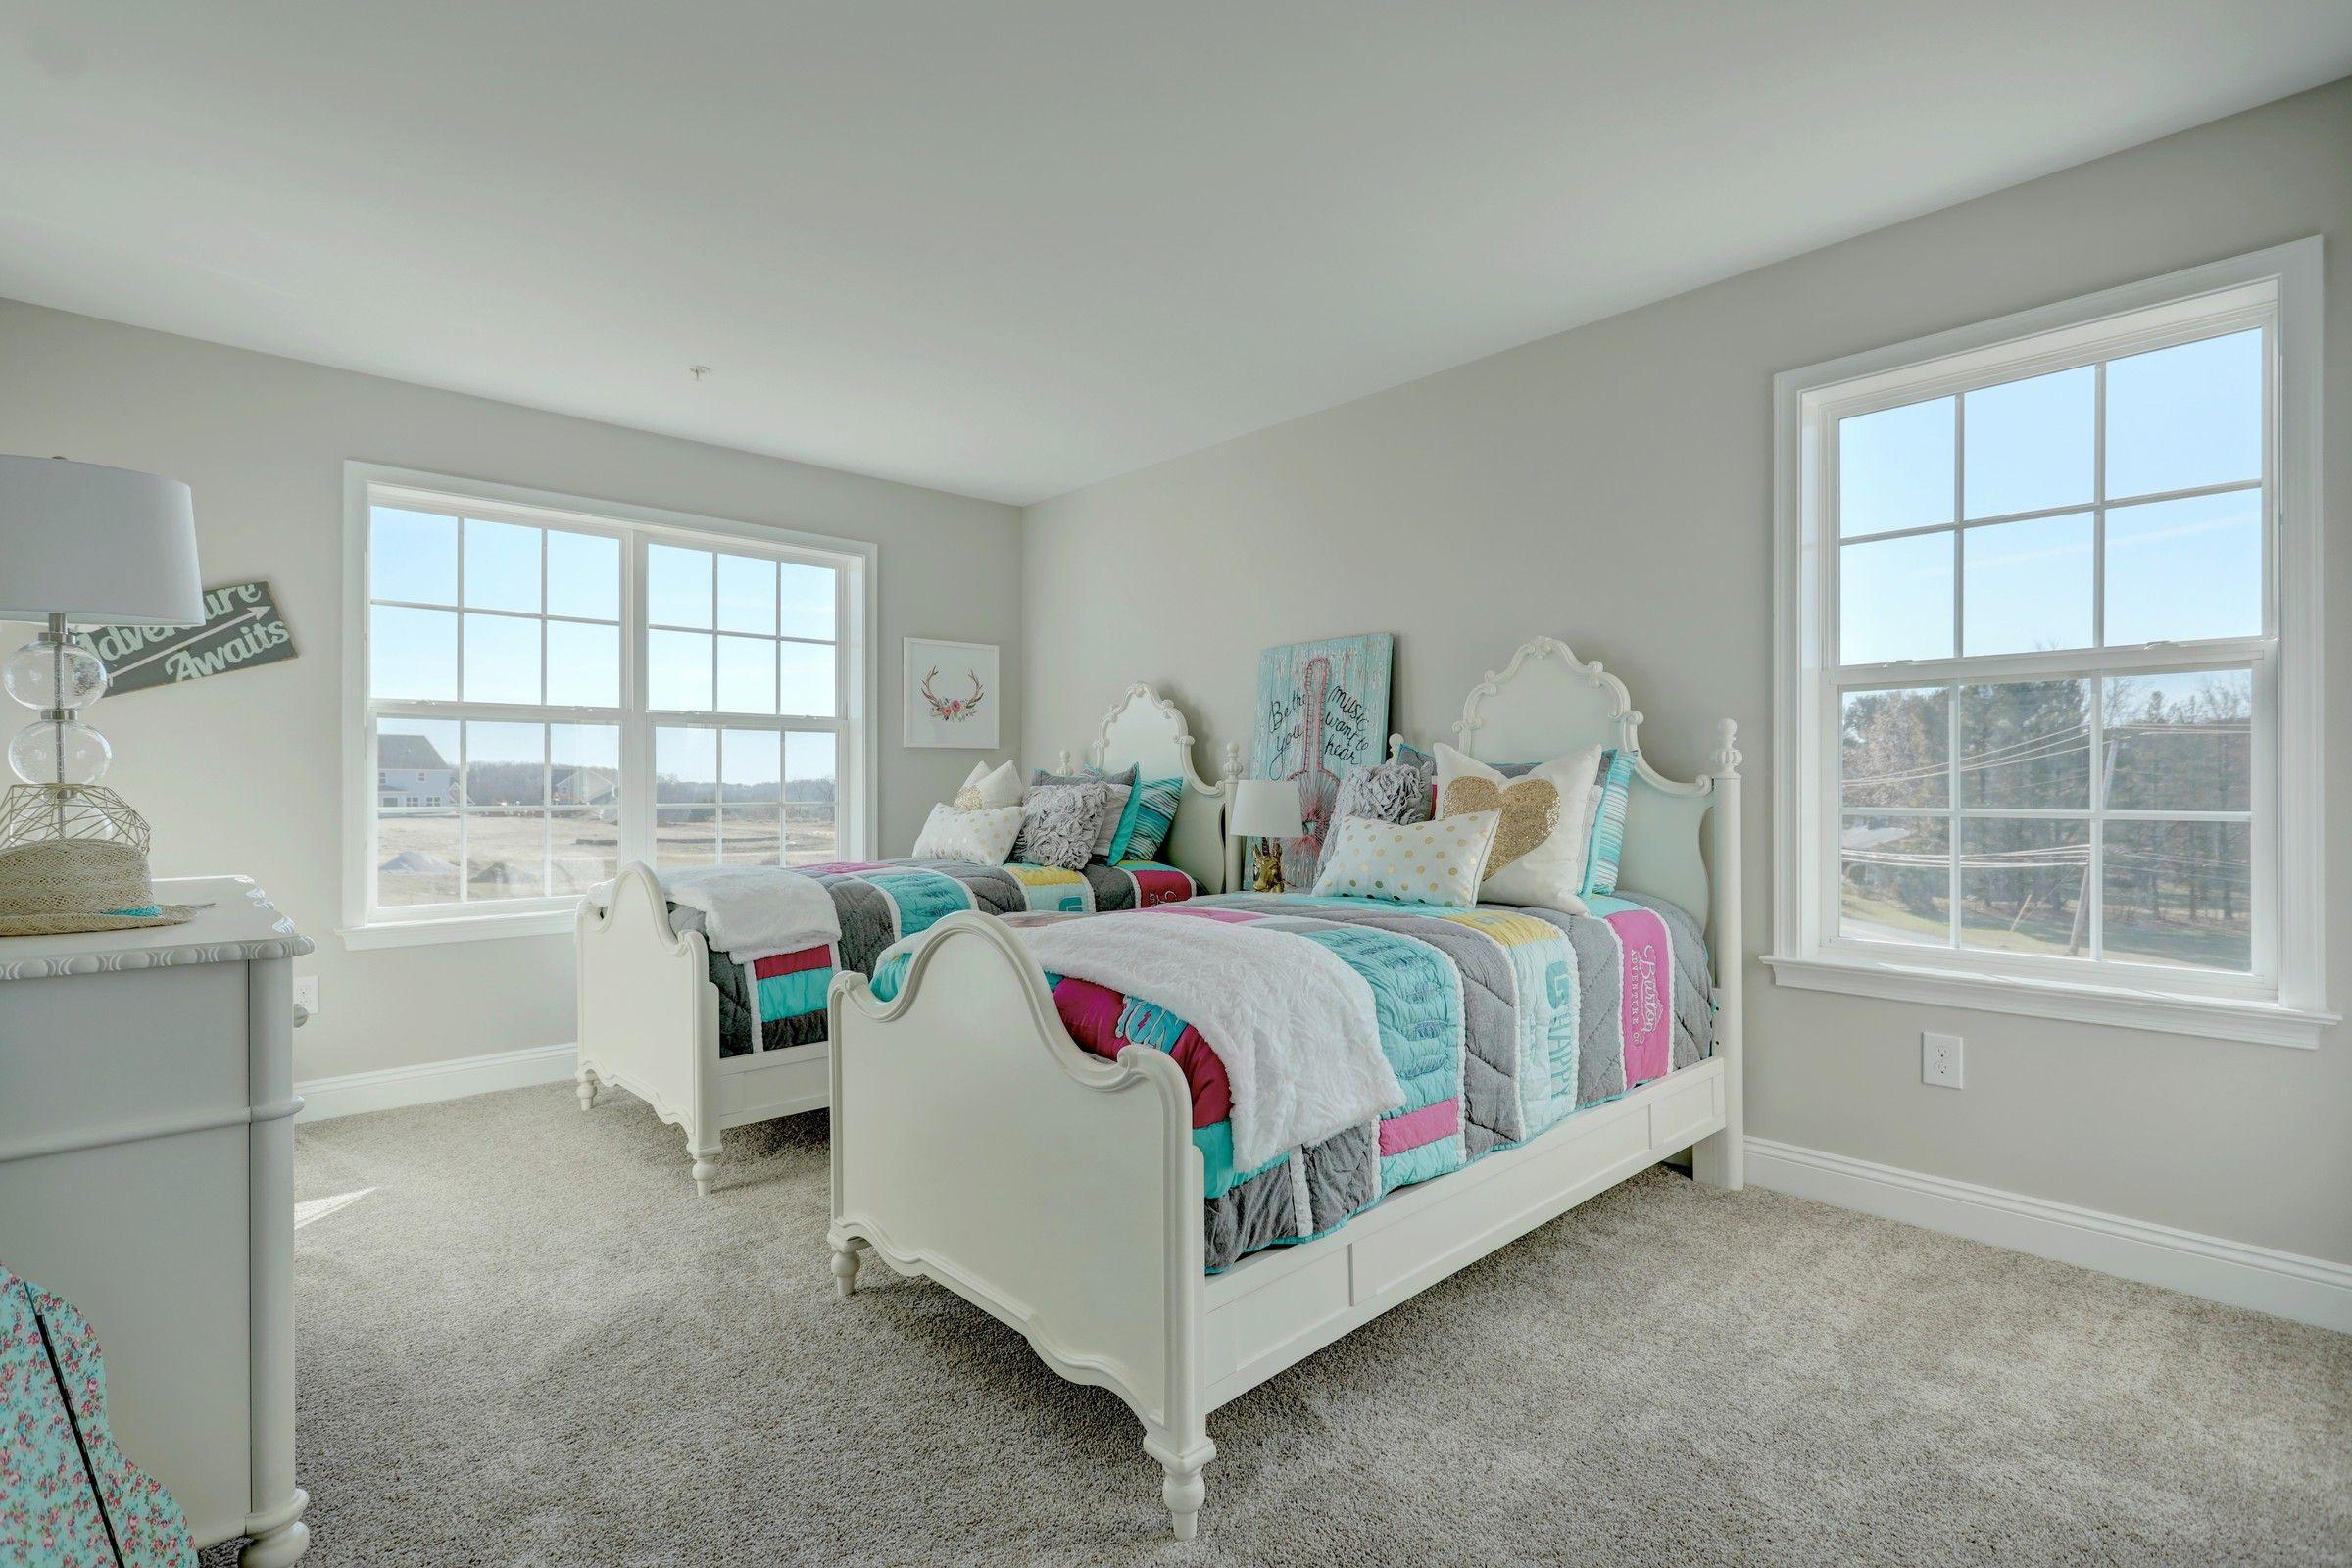 Bedroom featured in the Nottingham Vintage By Keystone Custom Homes in Harrisburg, PA